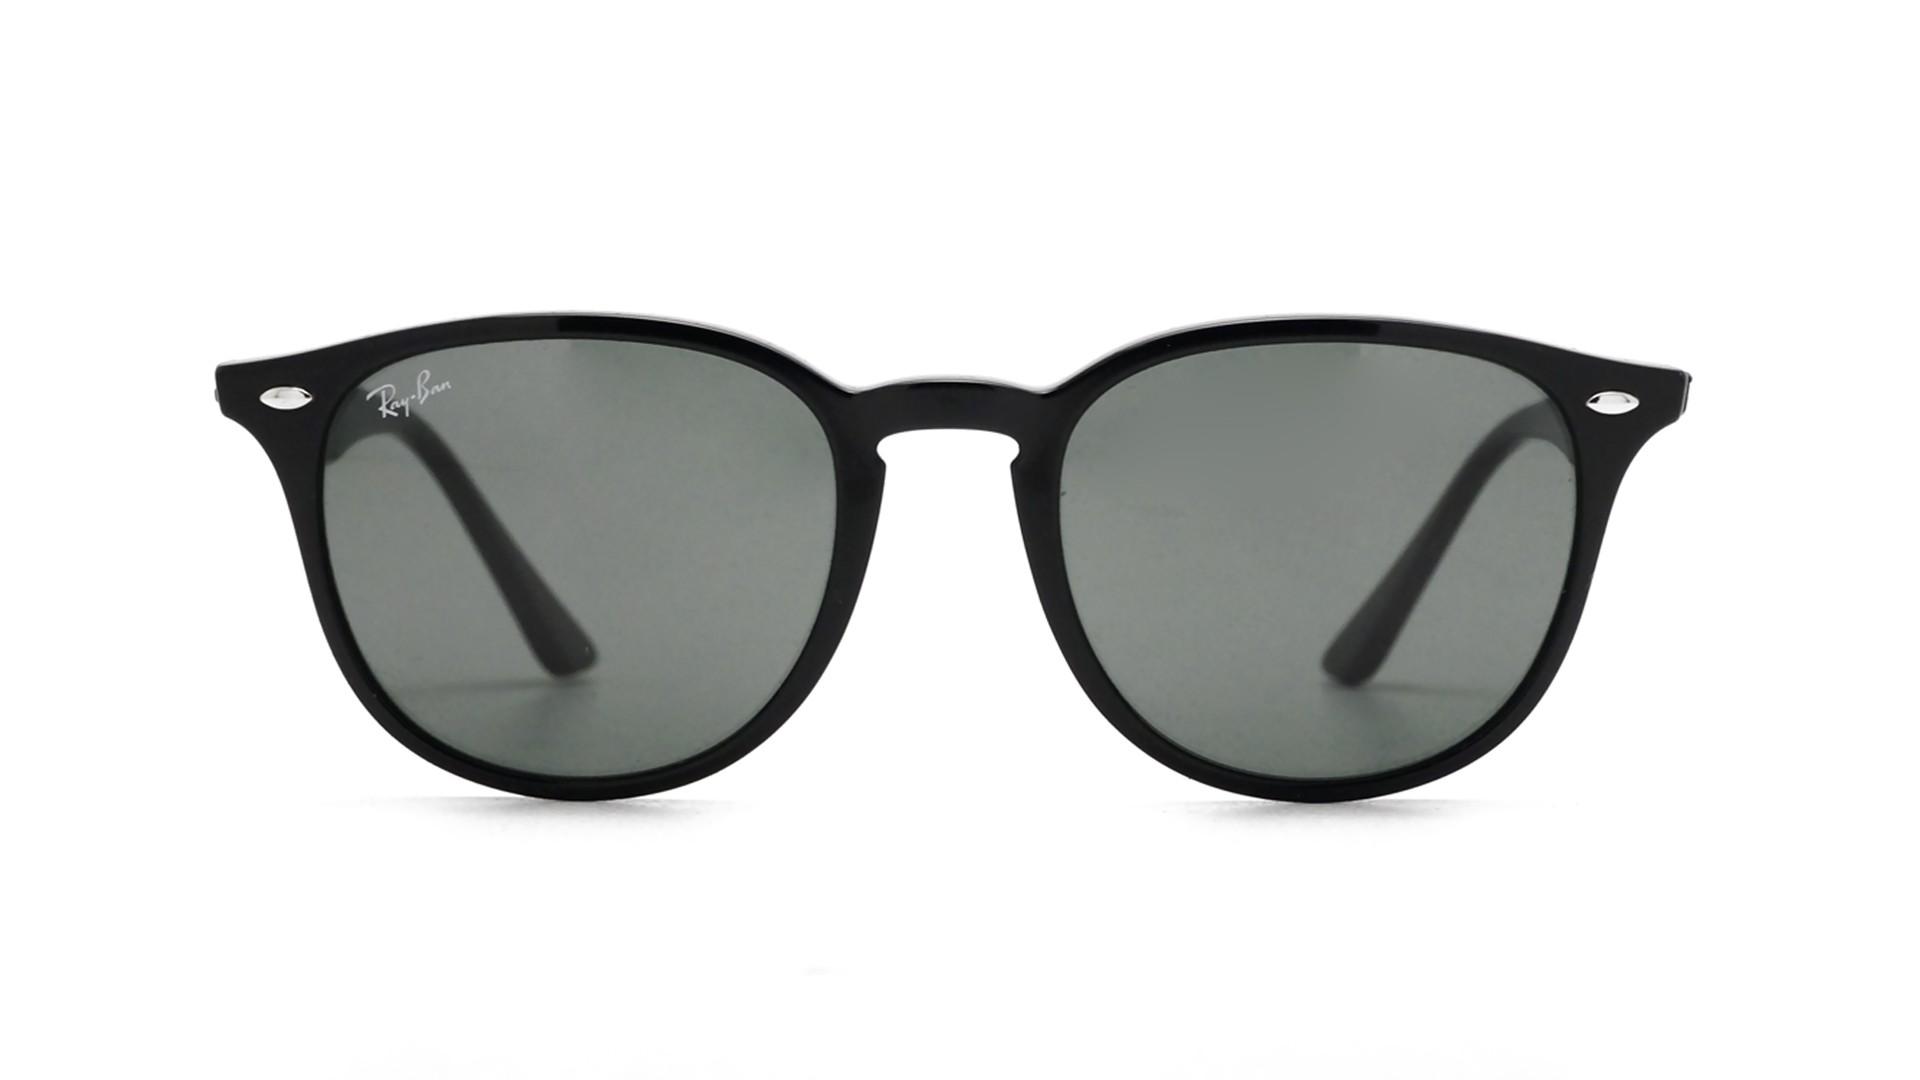 253d6fdc412 Sunglasses Ray-Ban RB4259 601 71 51-20 Black Medium